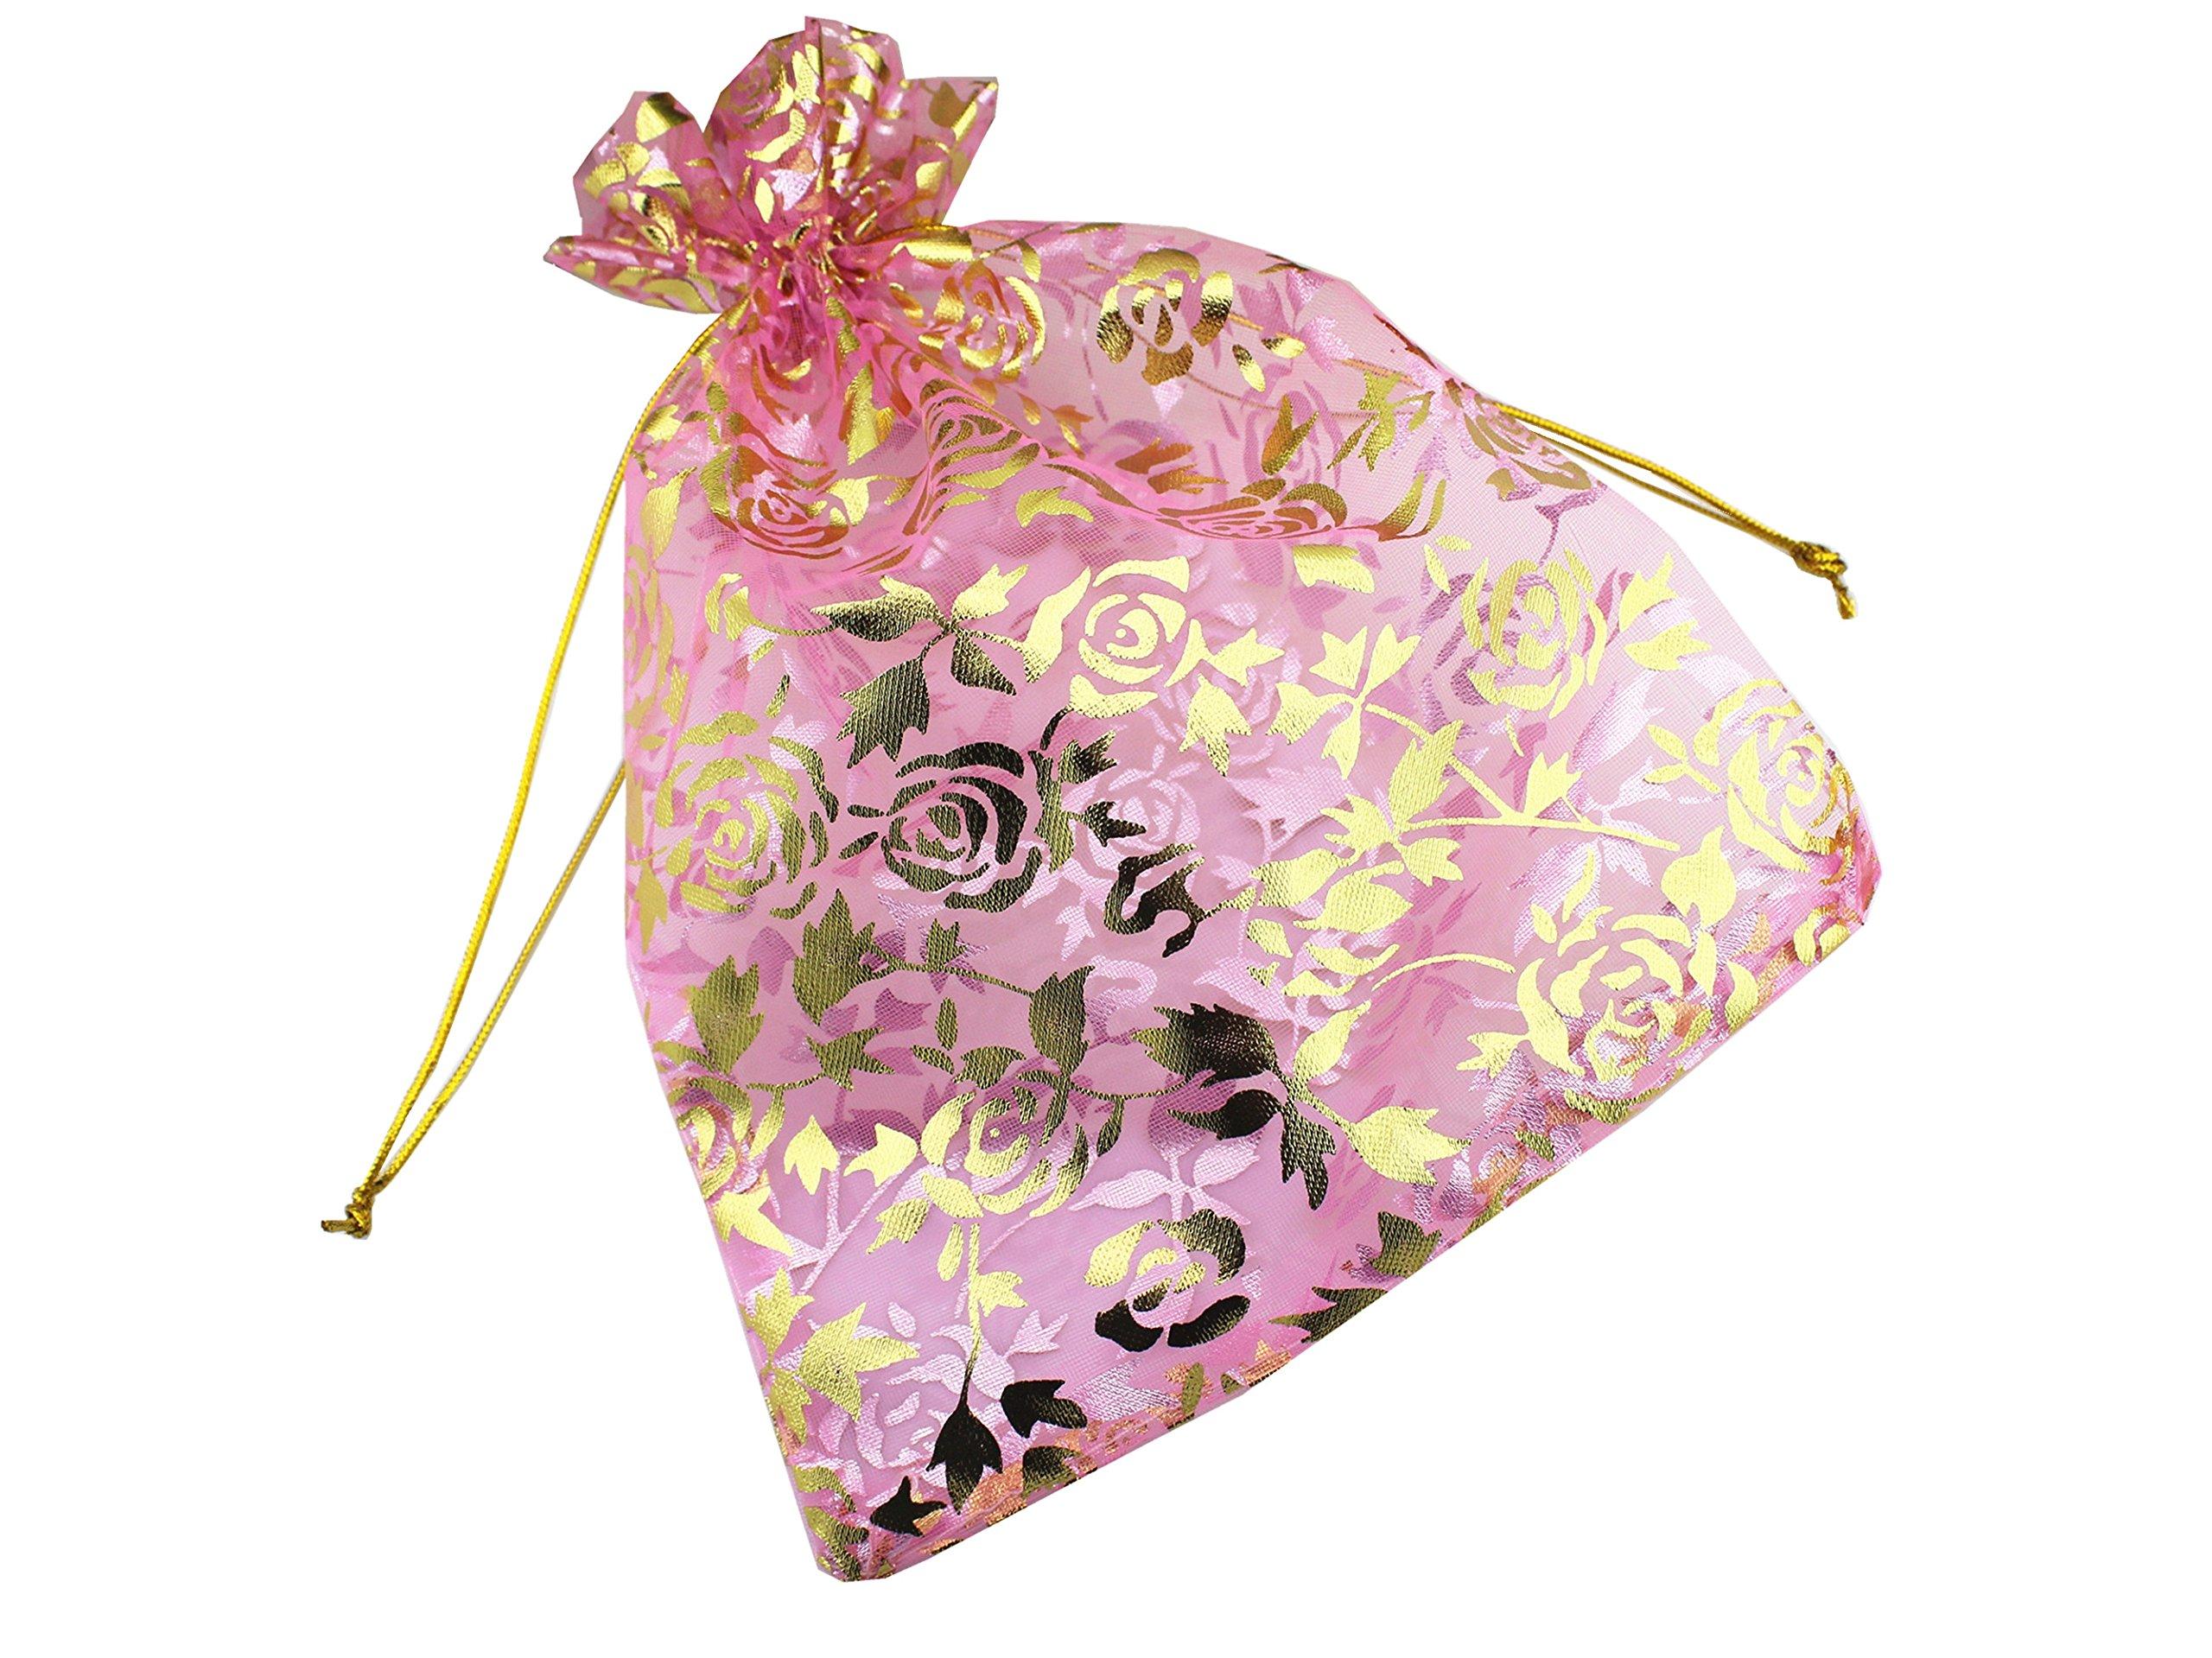 QIANHAILIZZ 8 x 12 Inch 100 Drawstring Heart Flower Bags Organza ...